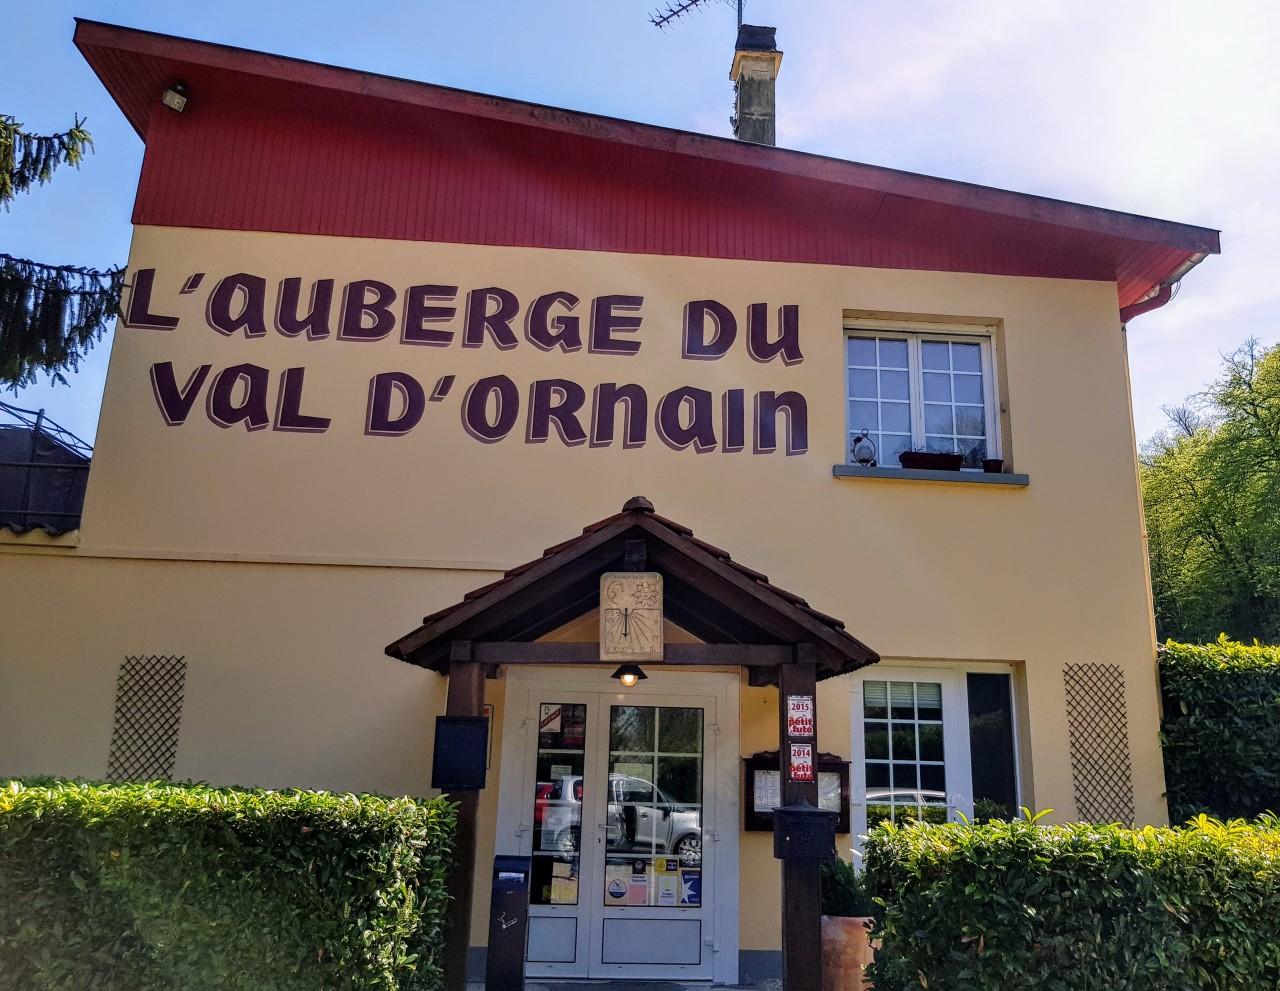 L'Auberge du Val d'Ornain àVARNEY